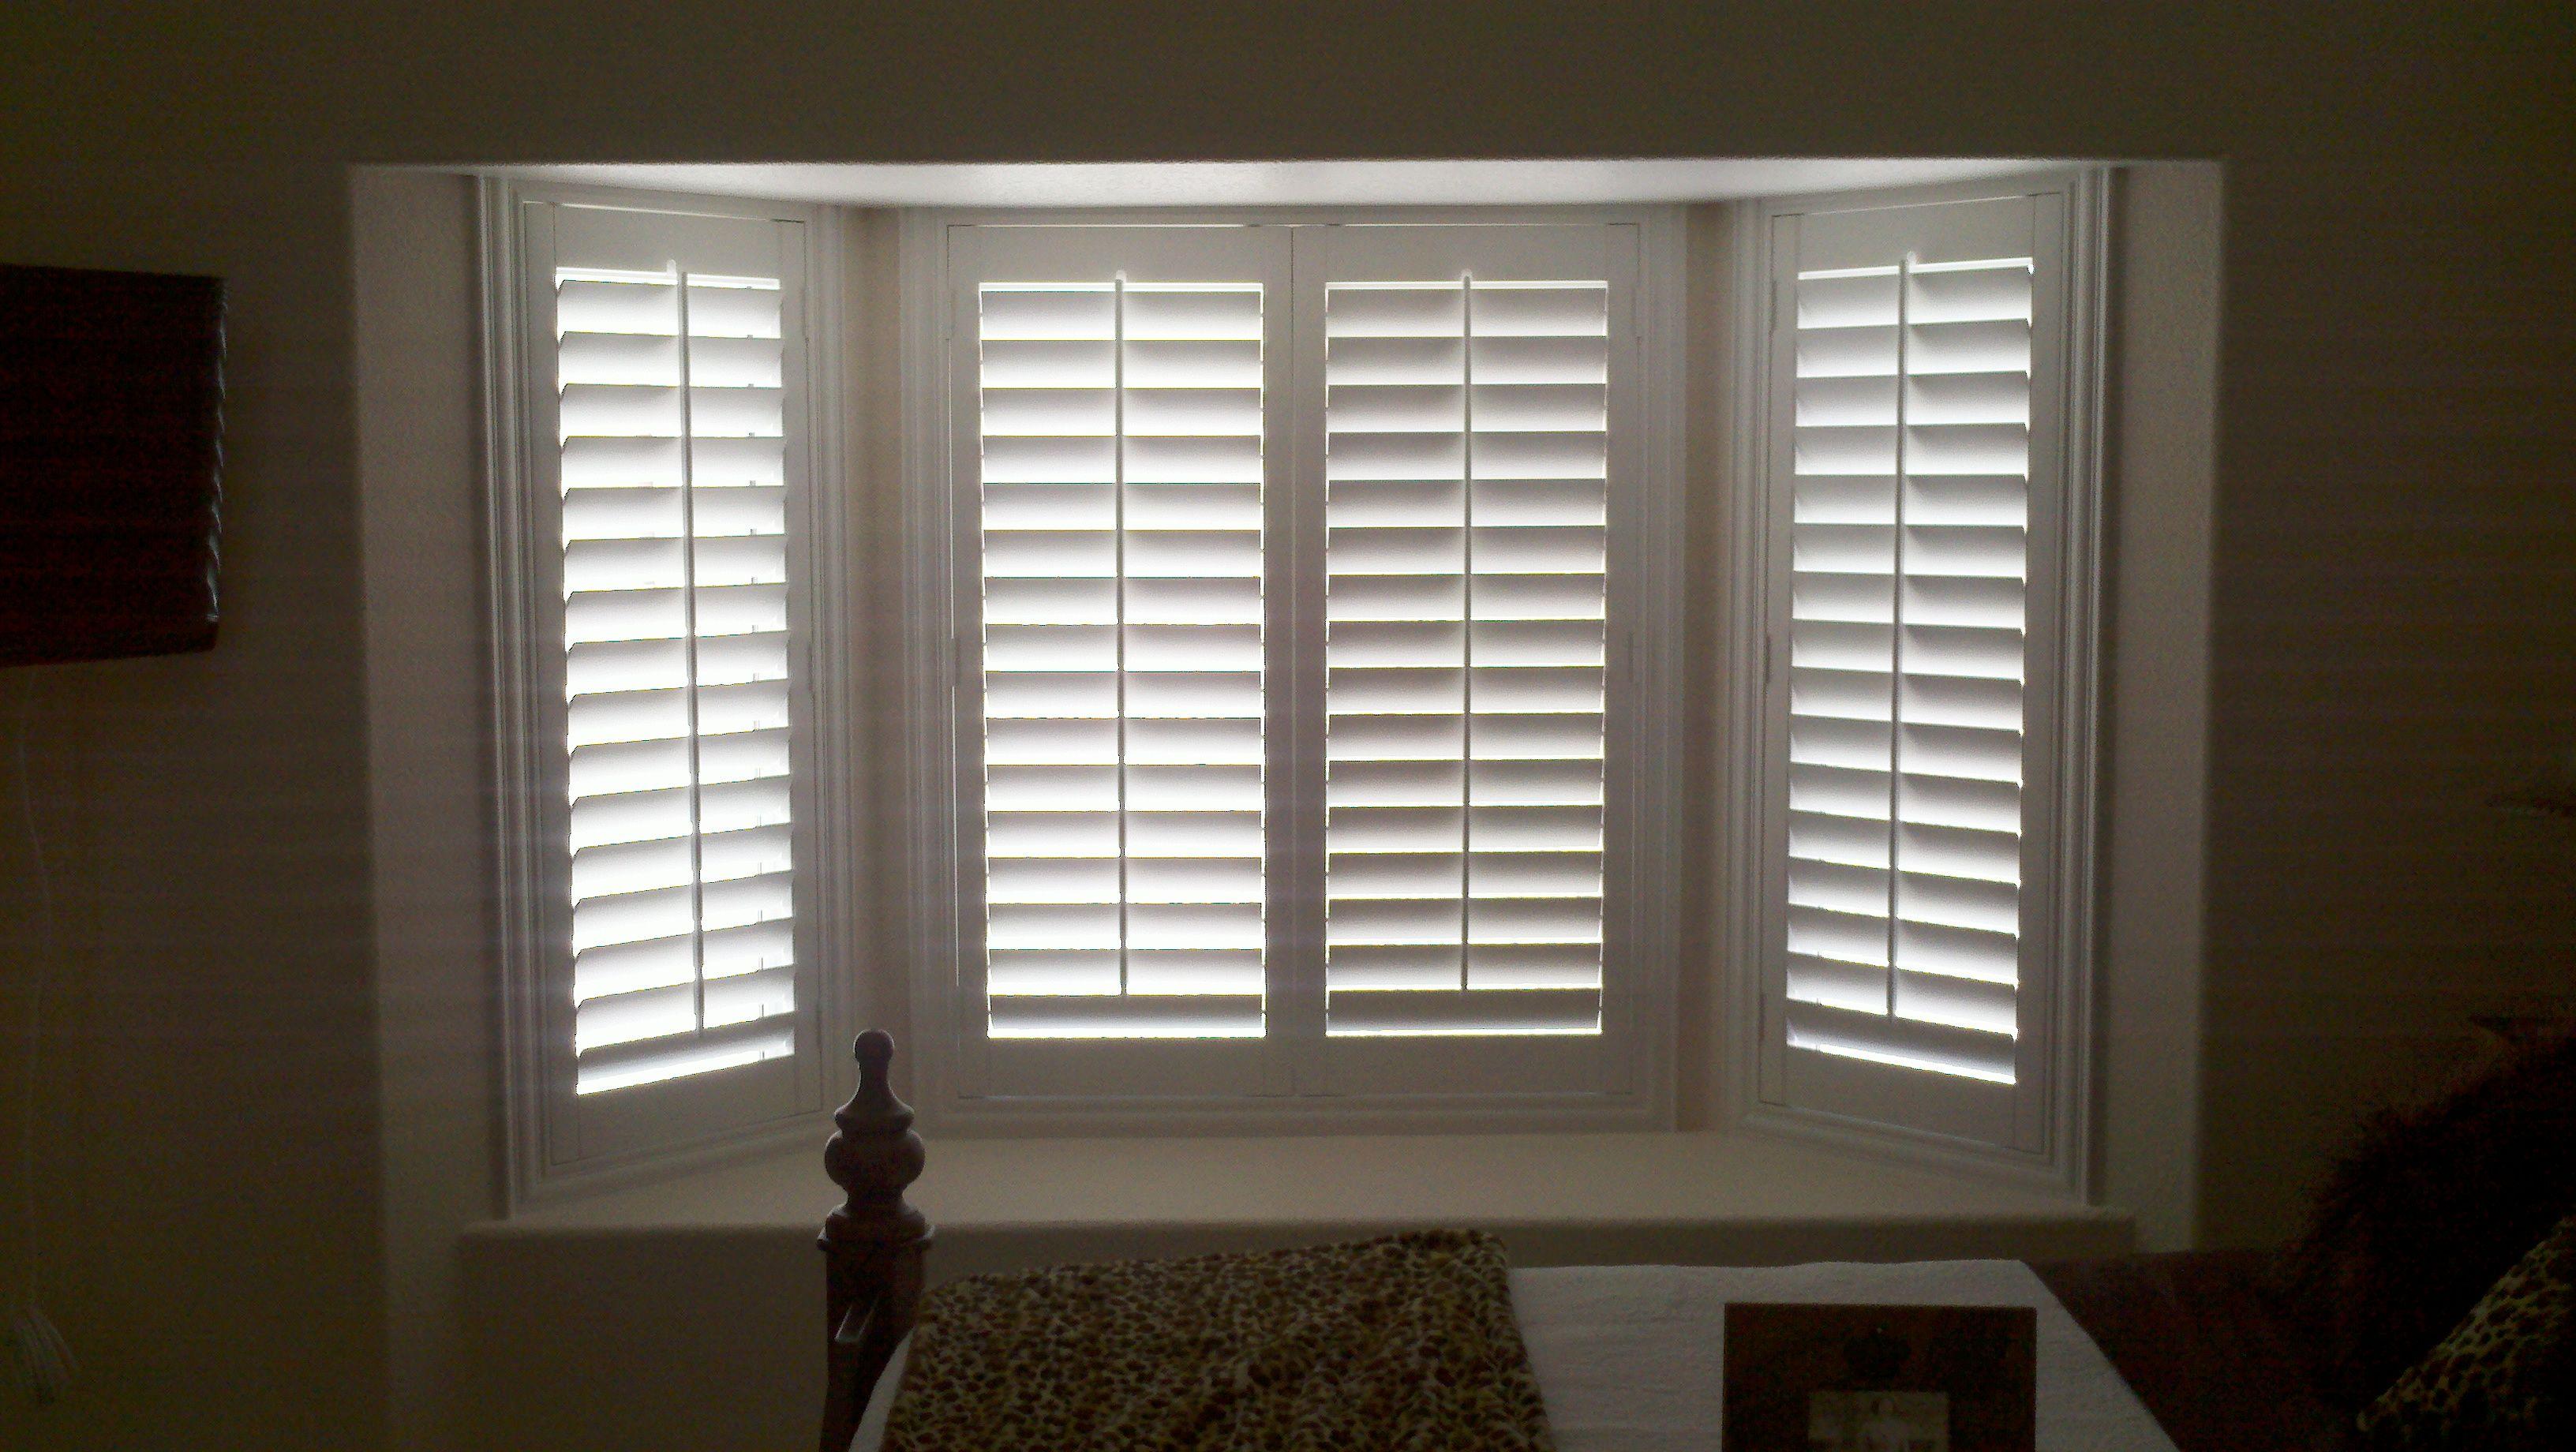 California Shutters For Bay Window Interior Doors For Sale Interior Window Shutters California Shutters